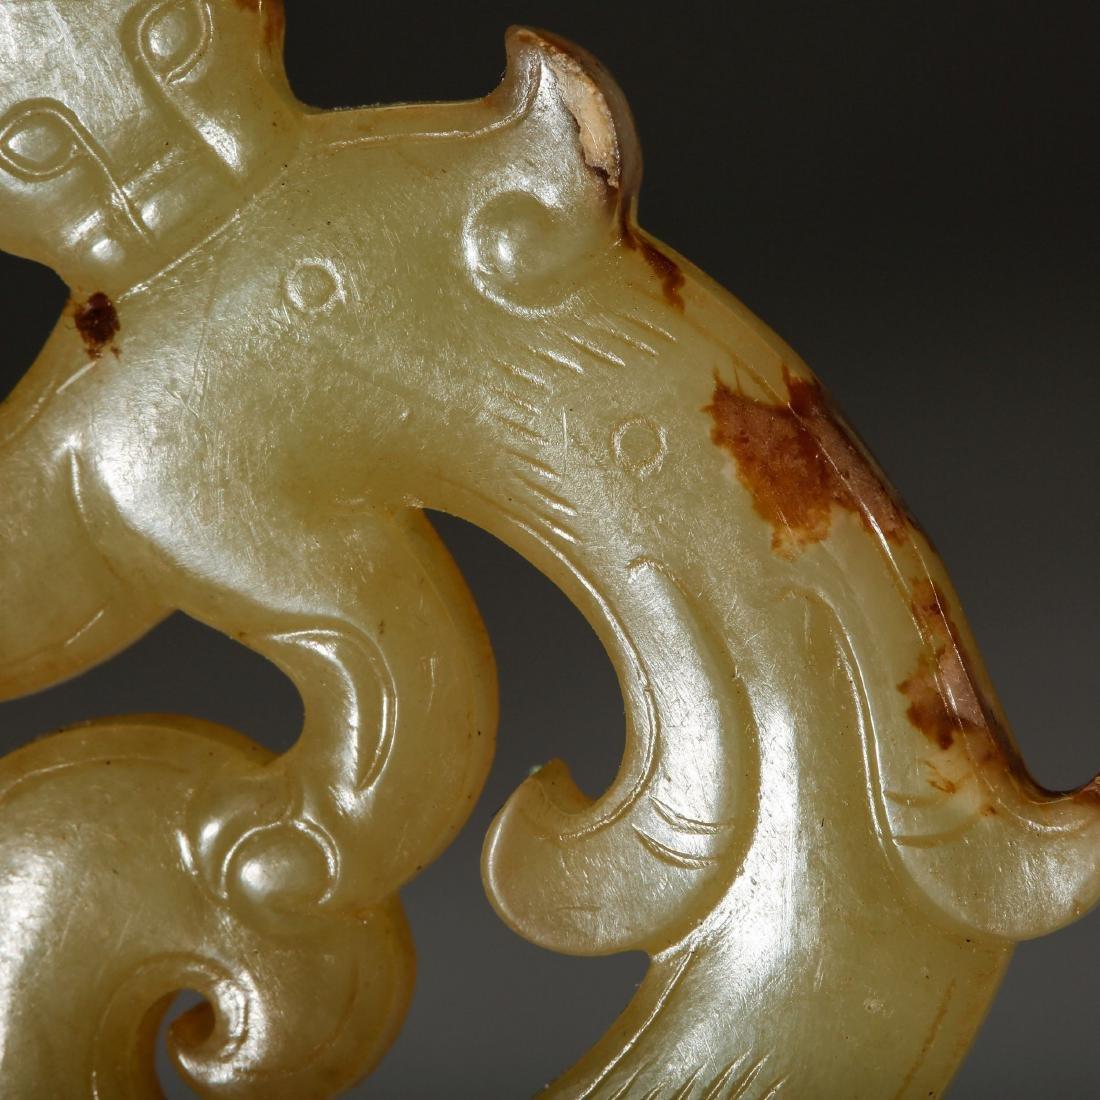 CHINESE ARCHAIC JADE PENDANT, HAN DYNASTY - 4